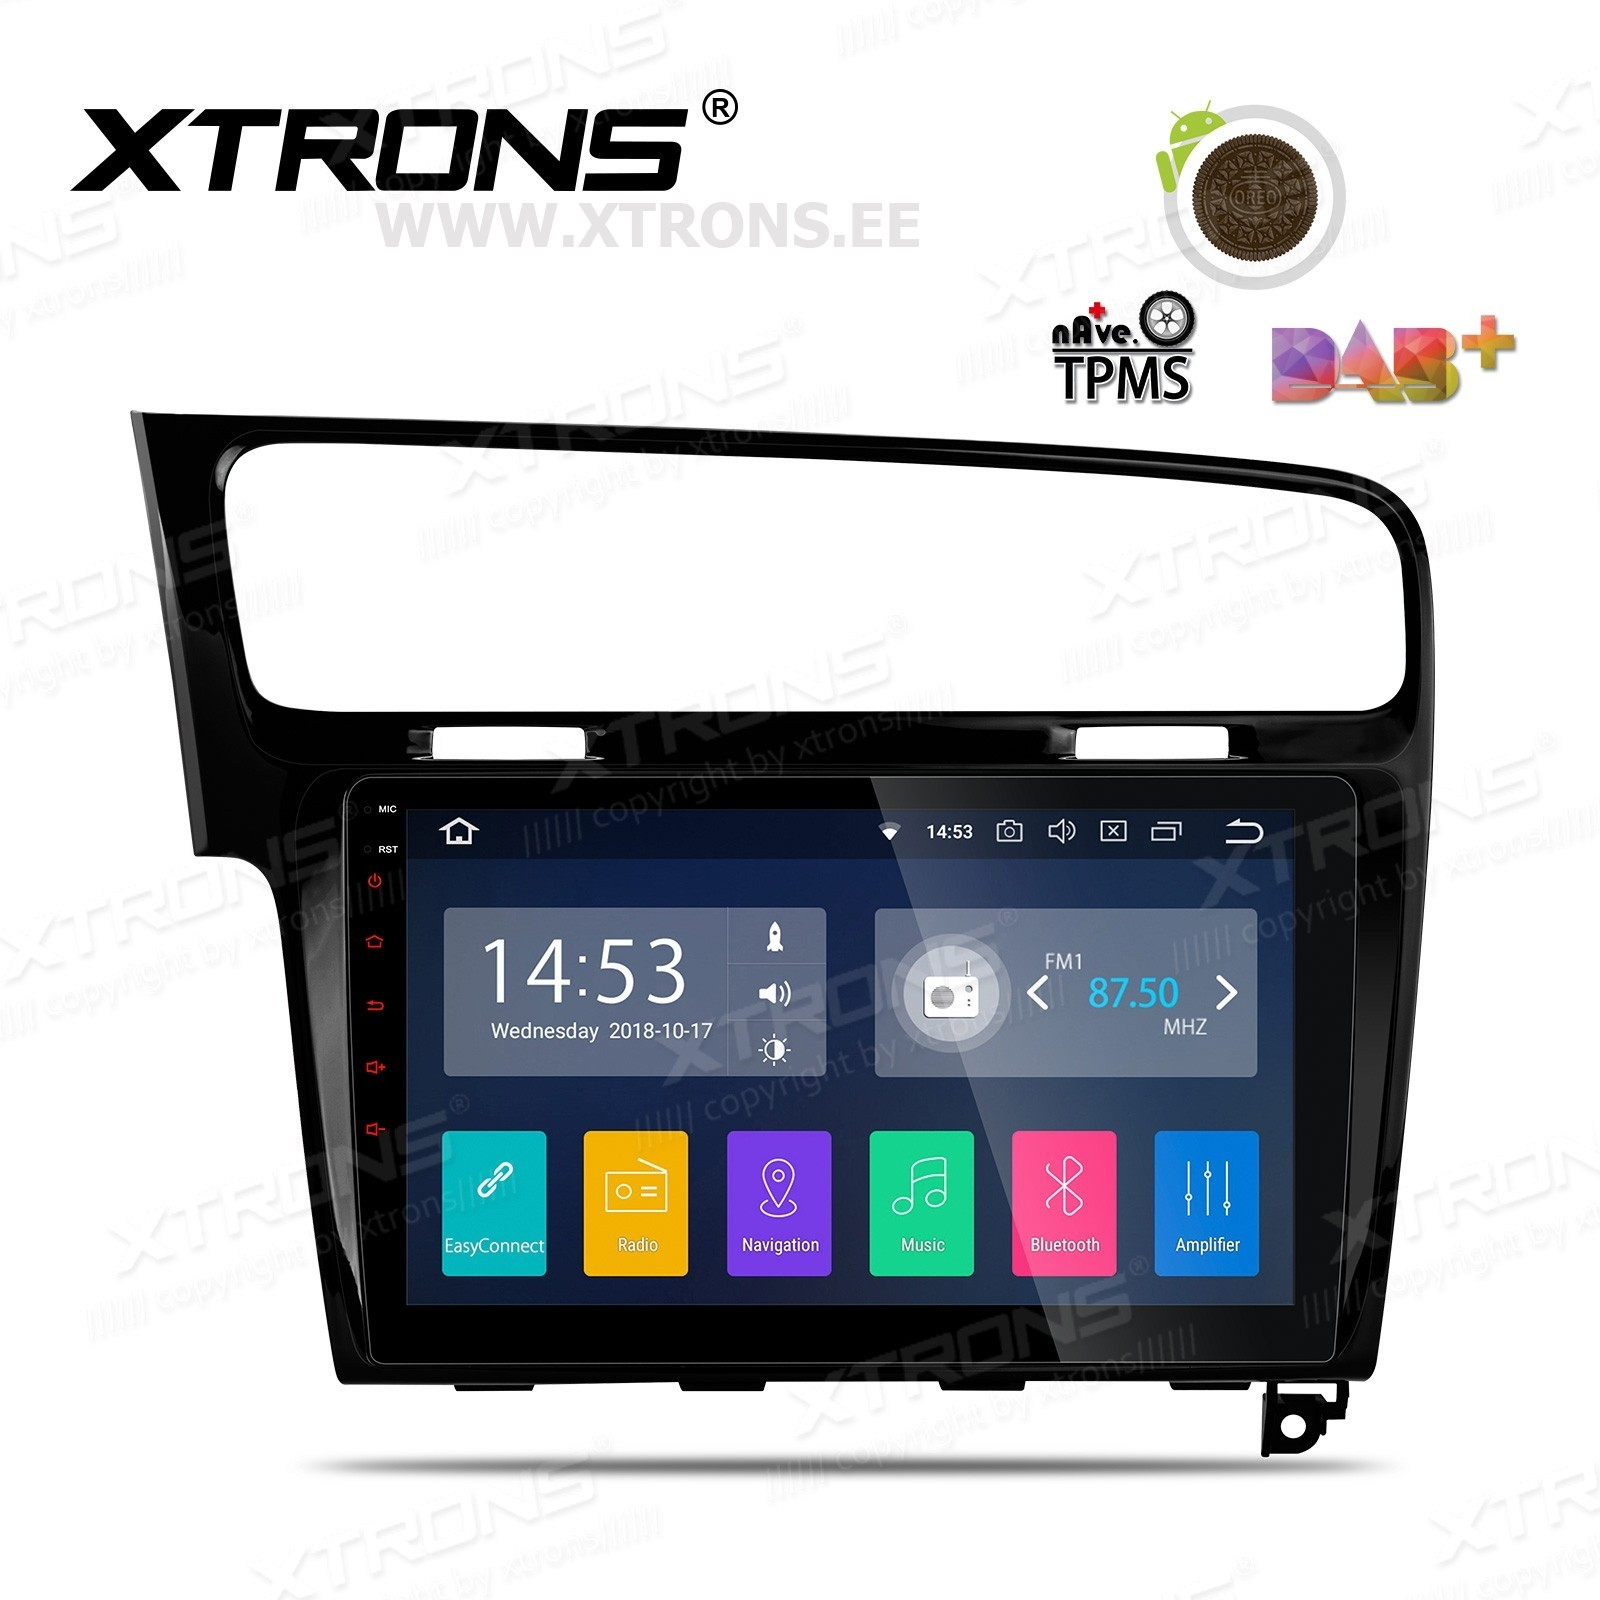 XTRONS PA18GFVIPL-LB